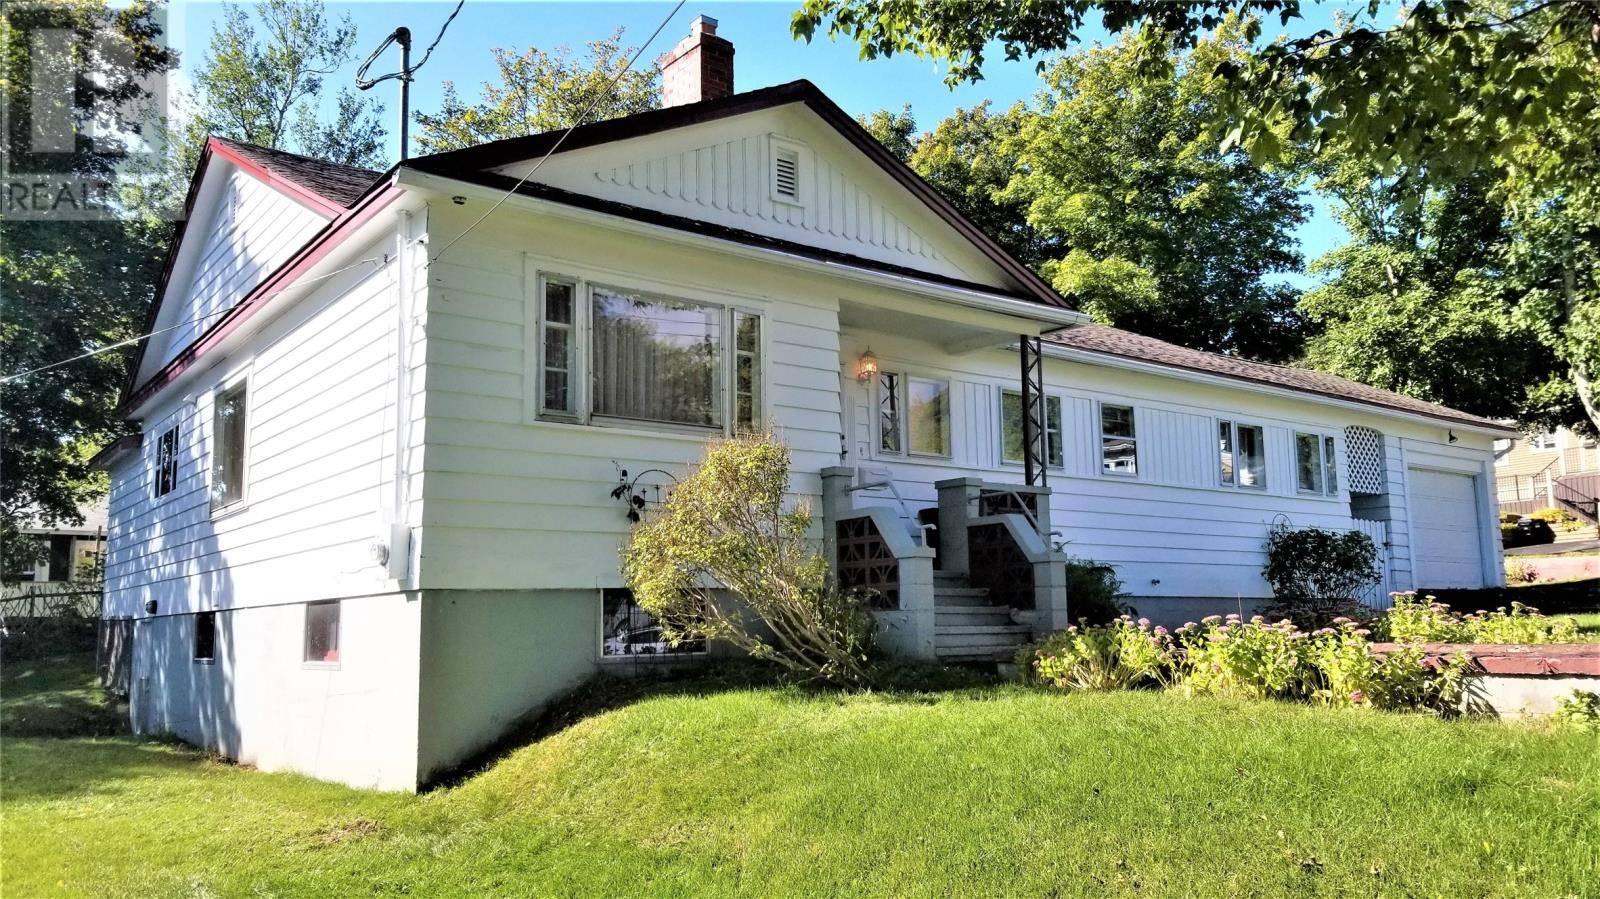 House for sale at 2 Amherst Pl St. John's Newfoundland - MLS: 1205077